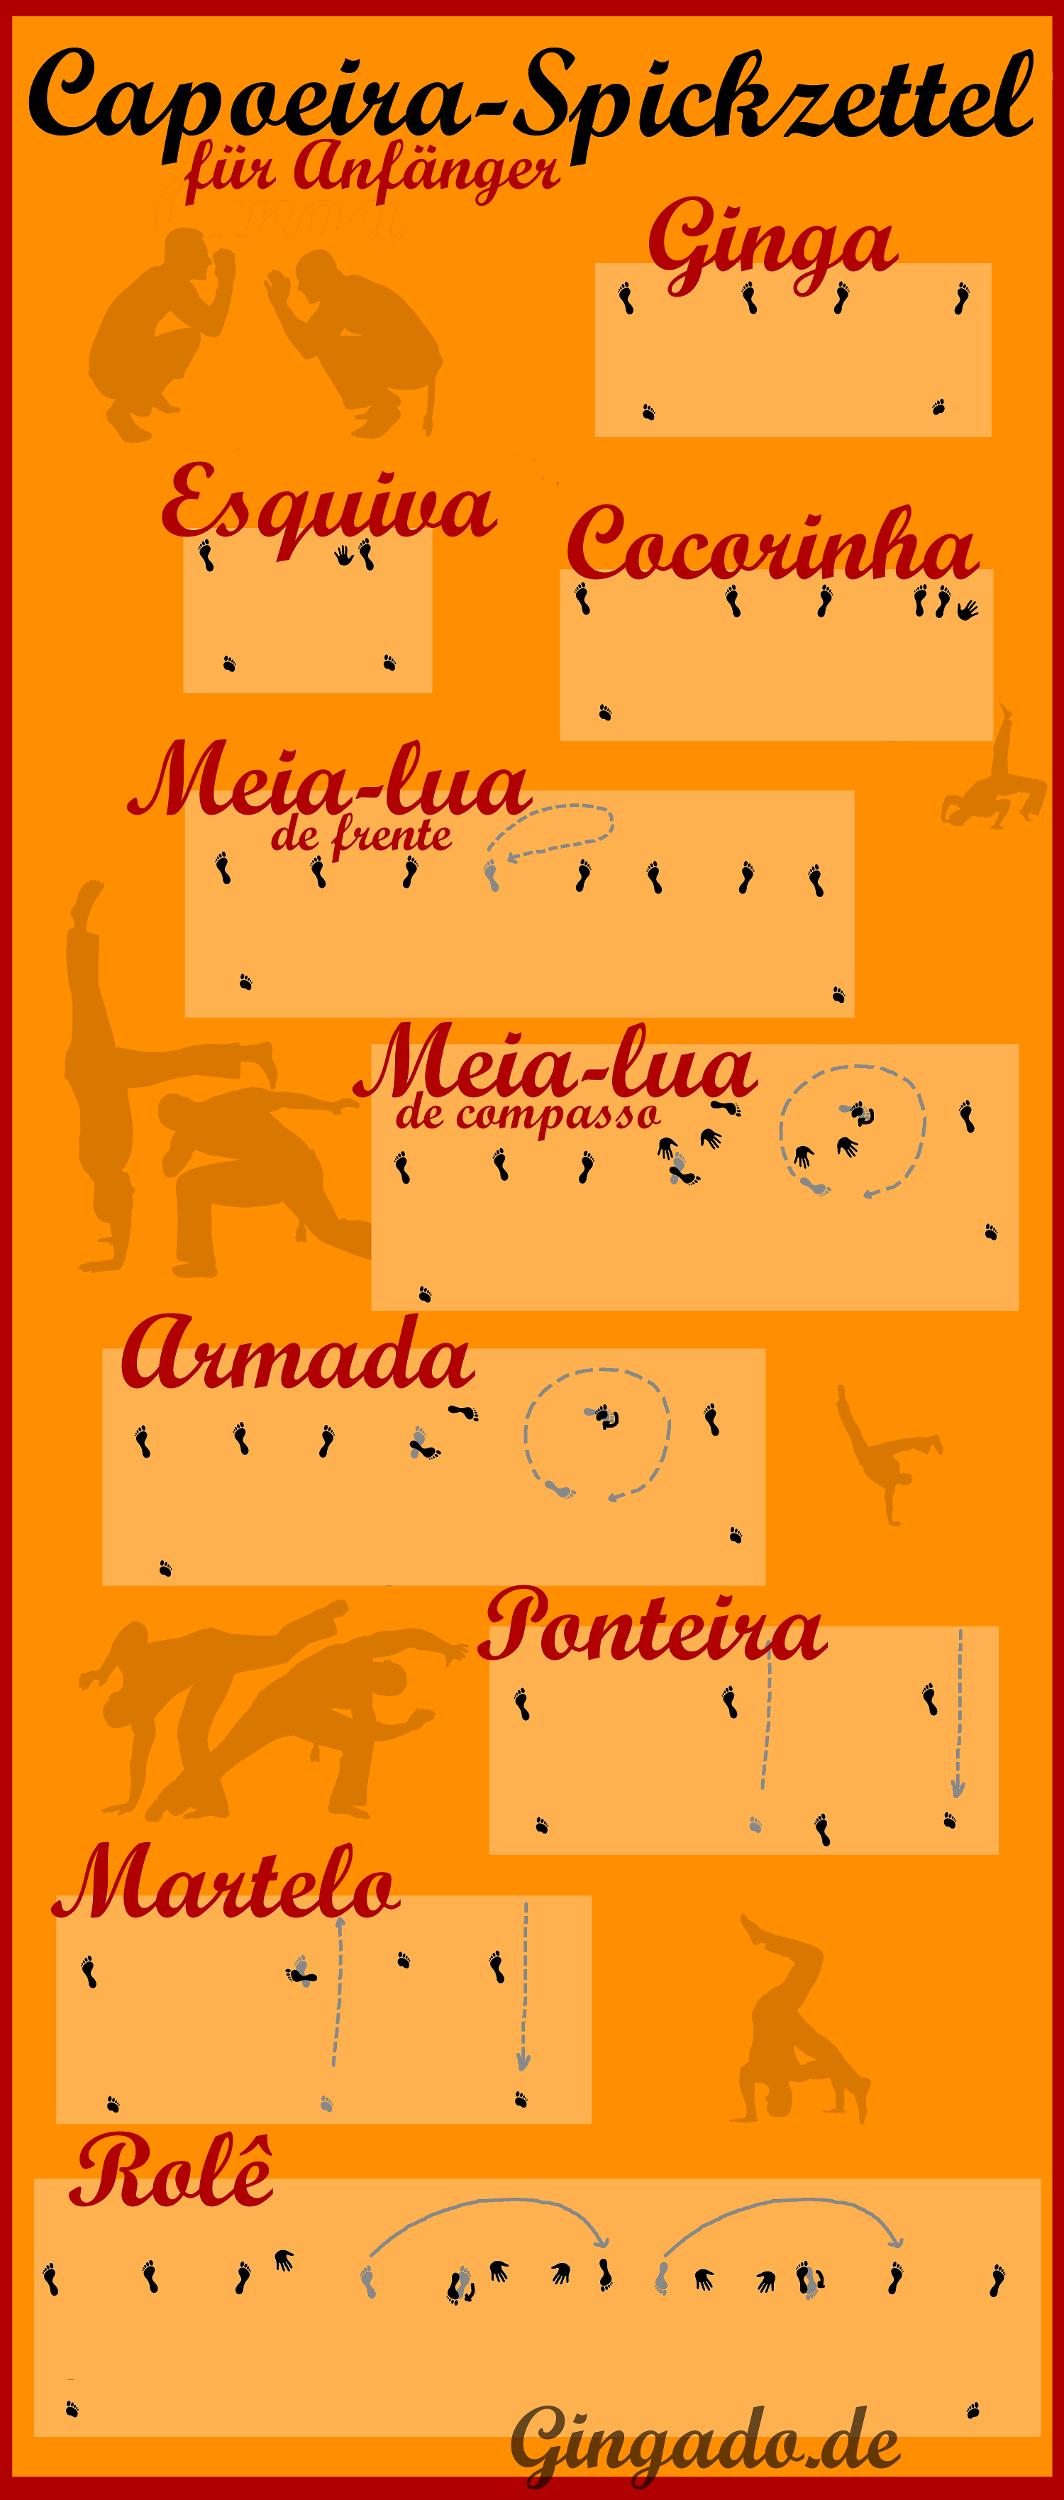 Capoeira Spickzettel